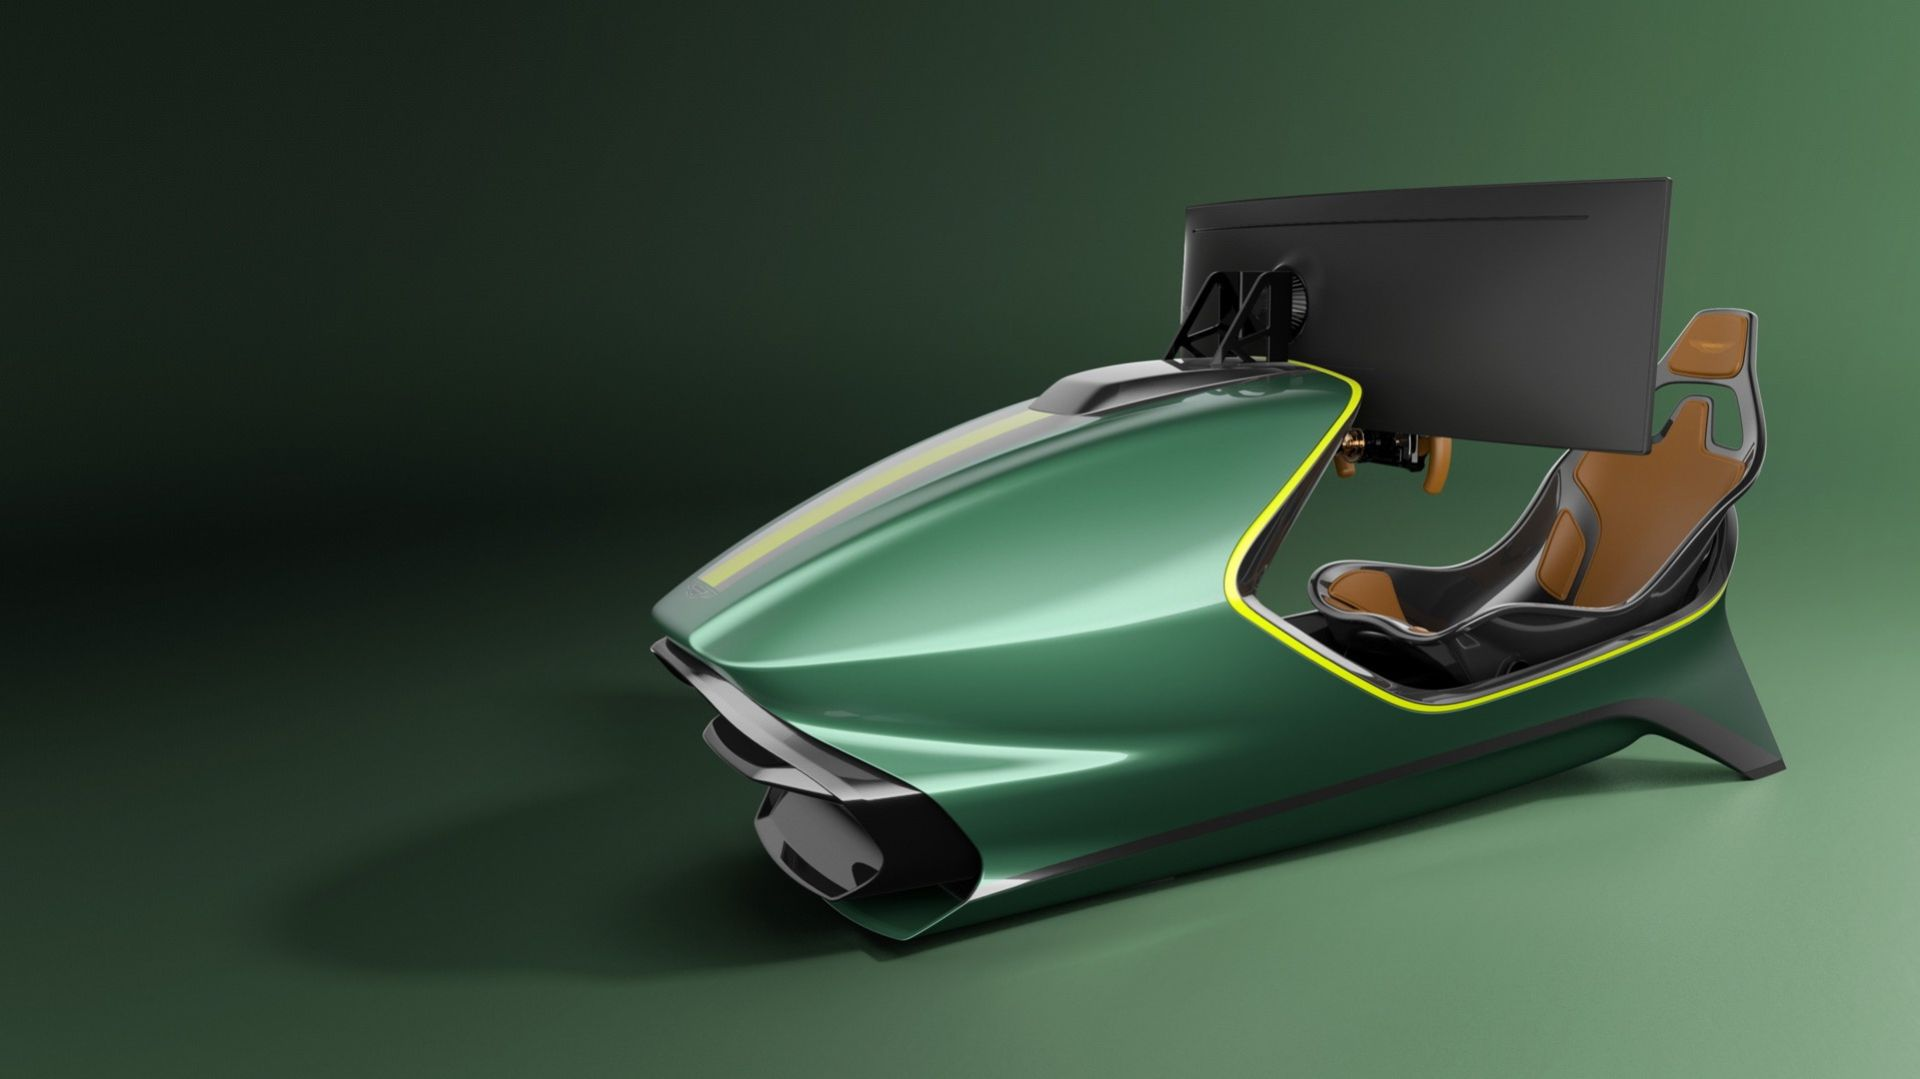 Aston Martin presenterar rejäl racing-simulator